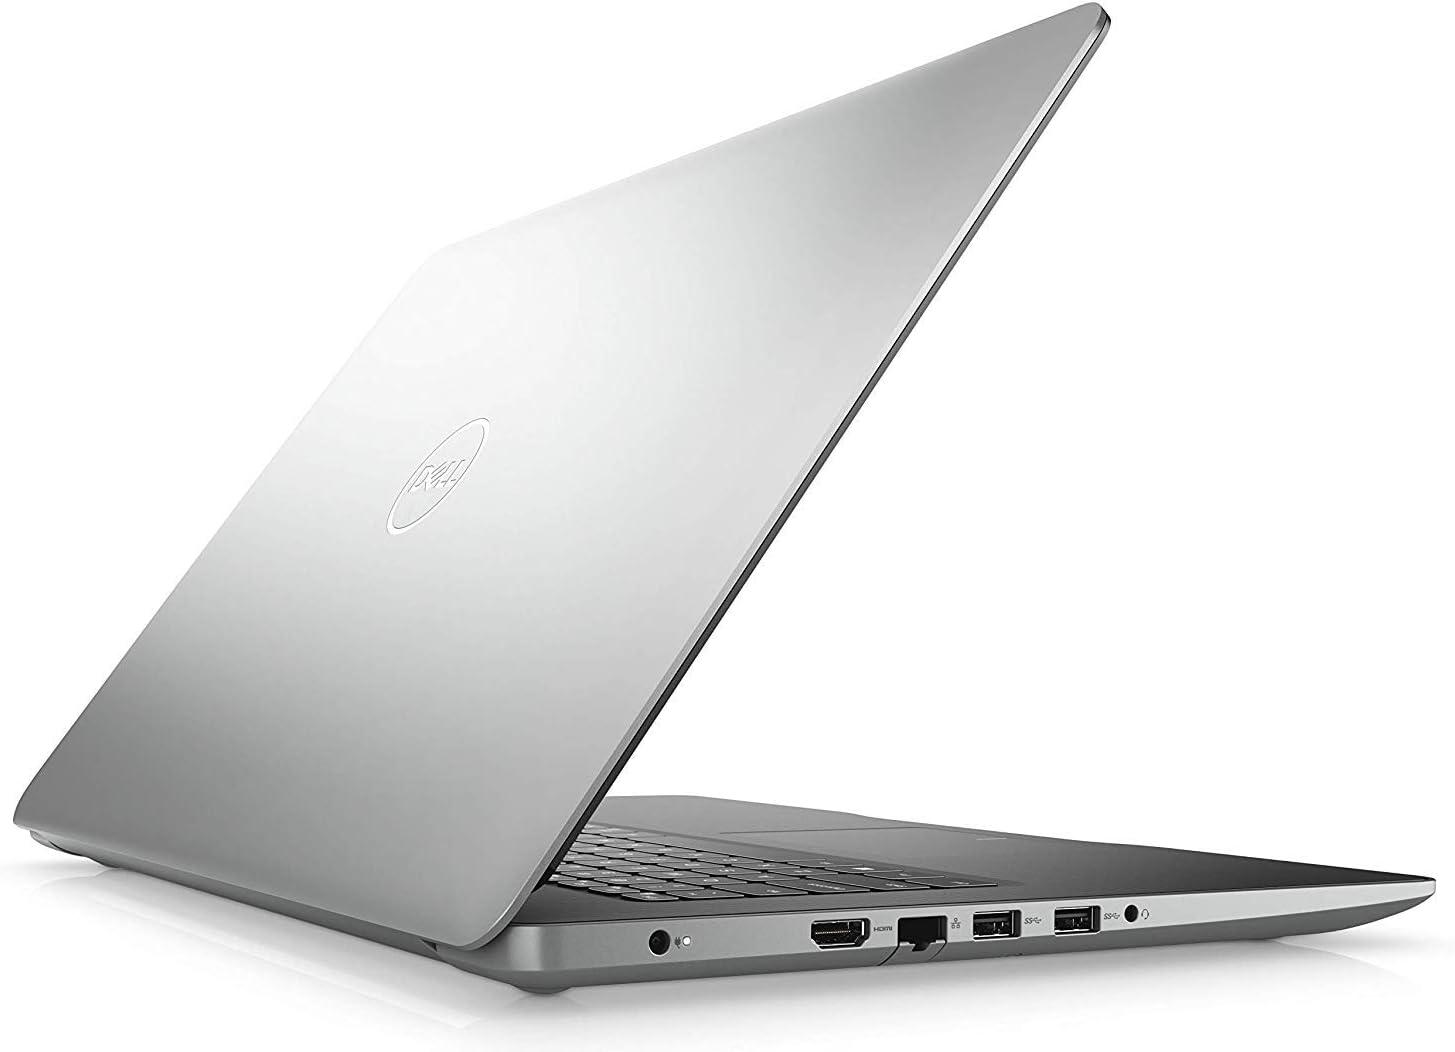 MS Office 2016 Pro Notebook INSPIRON 17 3793 Windows 10 500GB NVMe SSD 1000GB 44cm 17.3 Full HD Matt Intel Core i7-1065G7-8GB-RAM